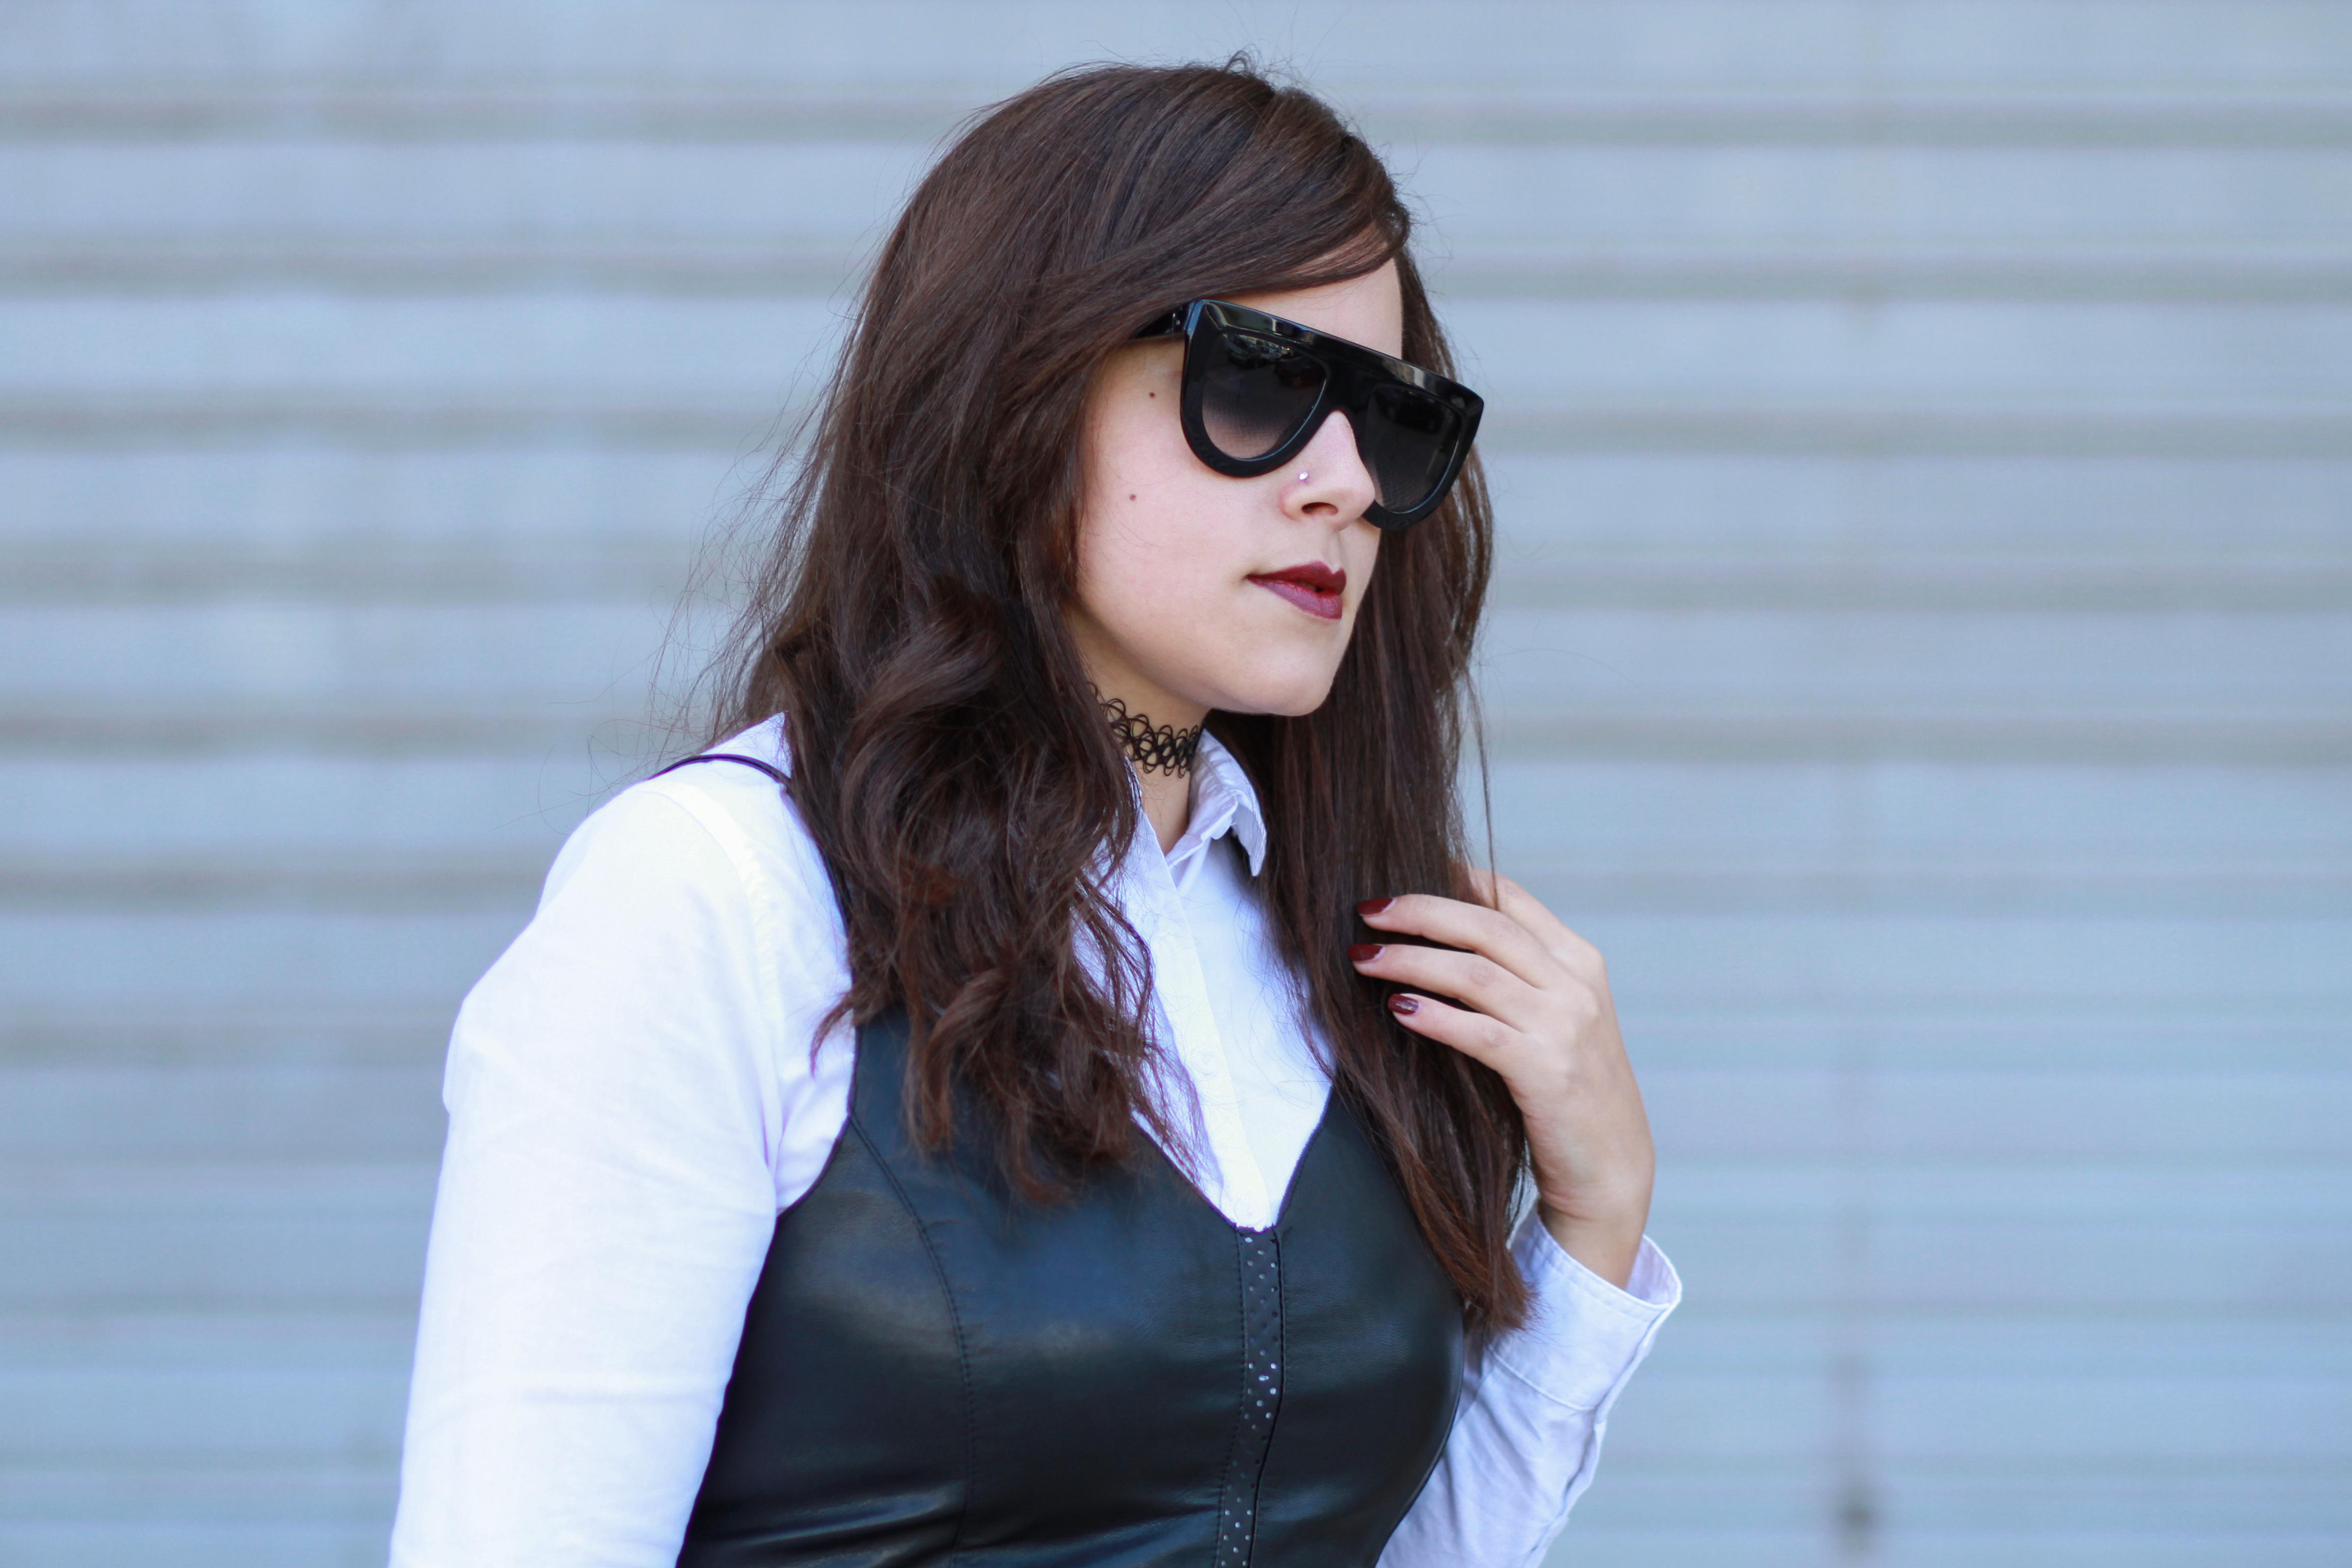 fake-leather-dress-blog-mode-chiccarpediem-3